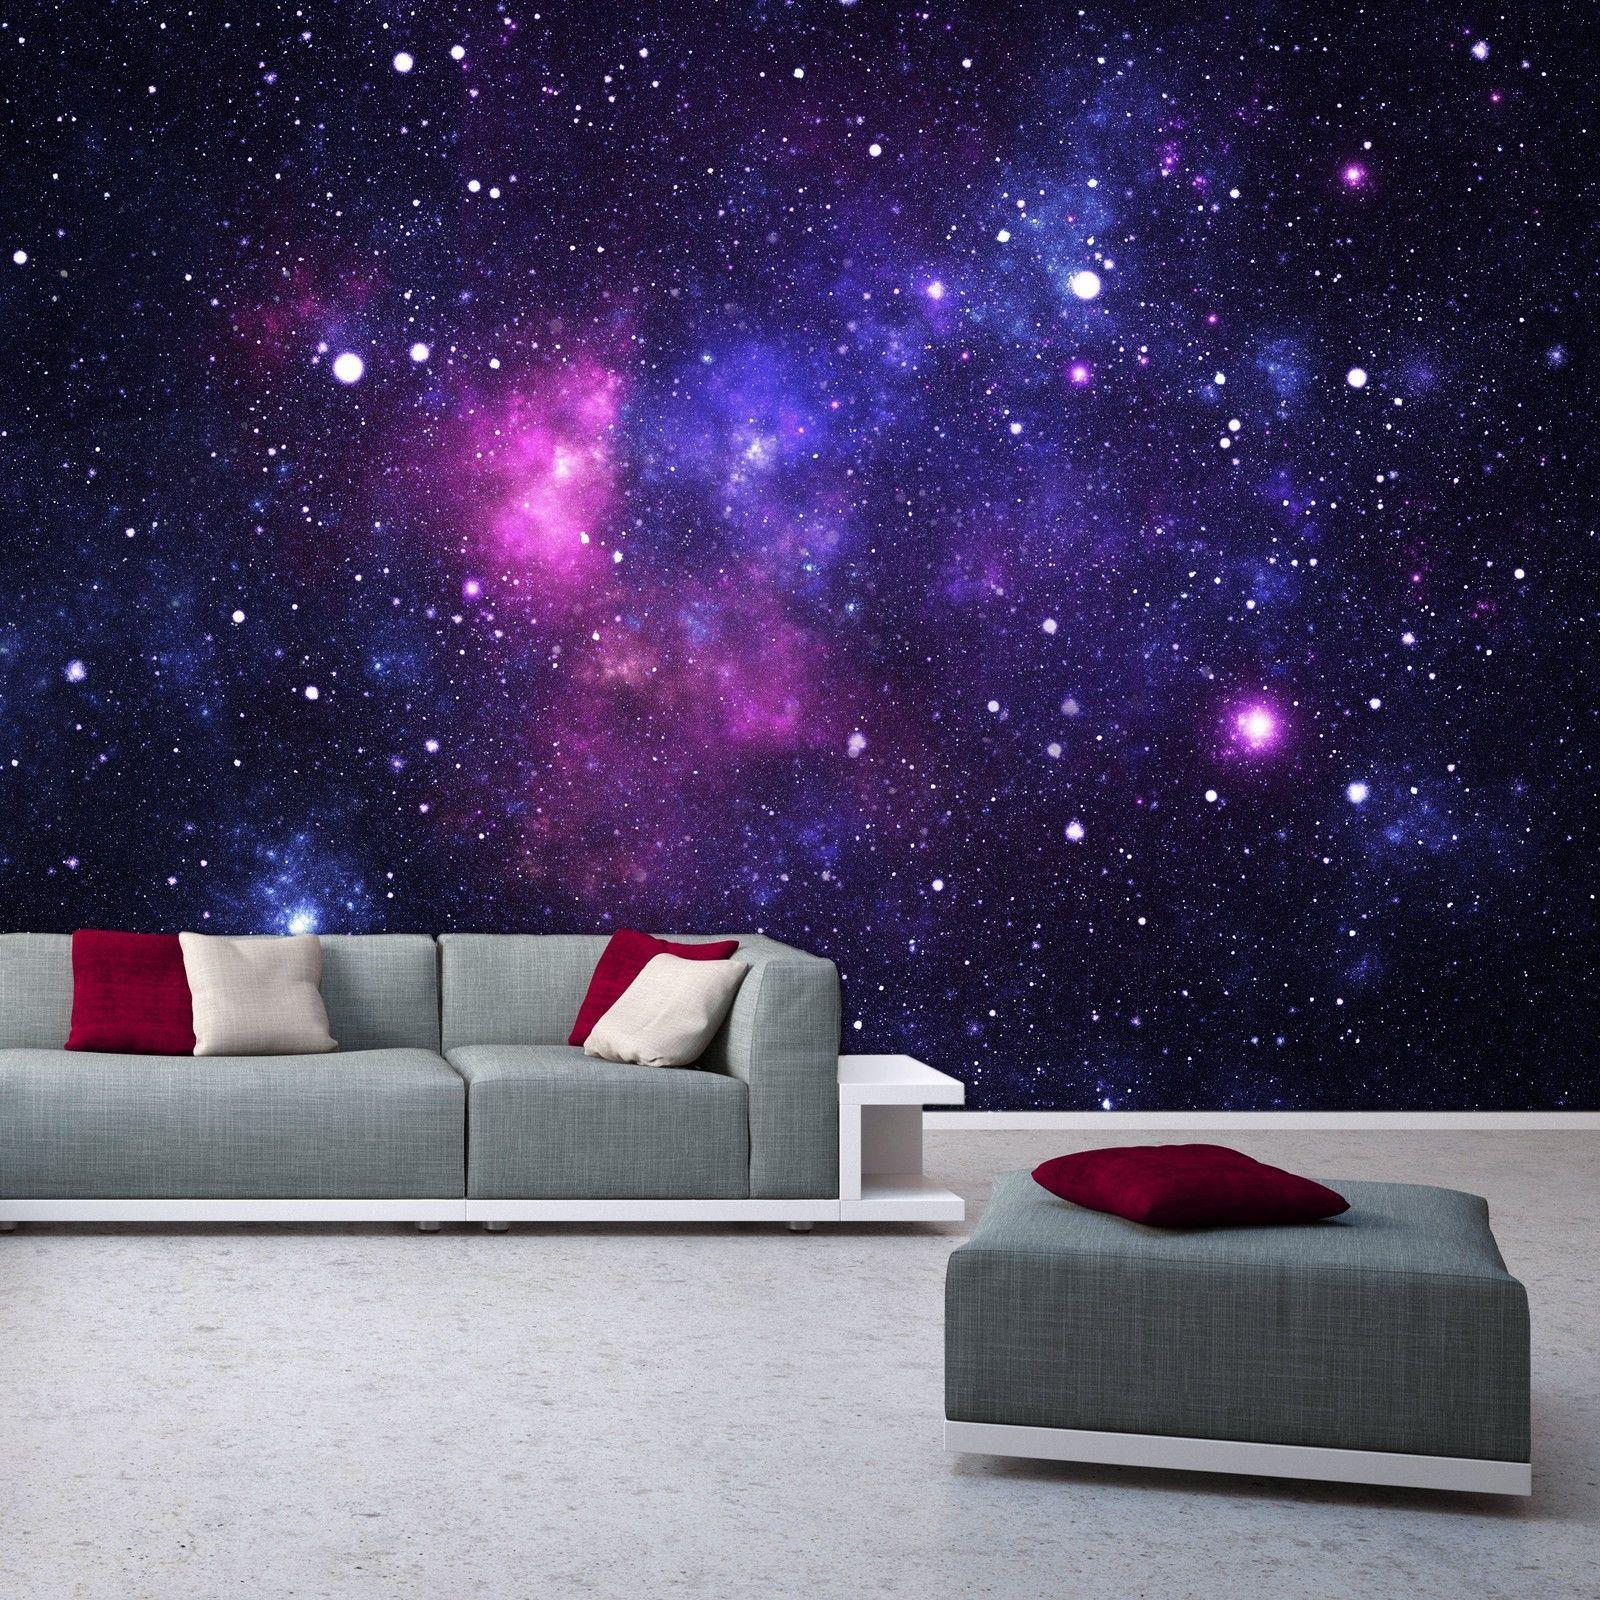 Photo Wallpaper Mural Galaxy 366x254 Cm Space Stars Universe Cosmos Deco Deals Galaxy Bedroom Photo Wallpaper Girls Room Wallpaper